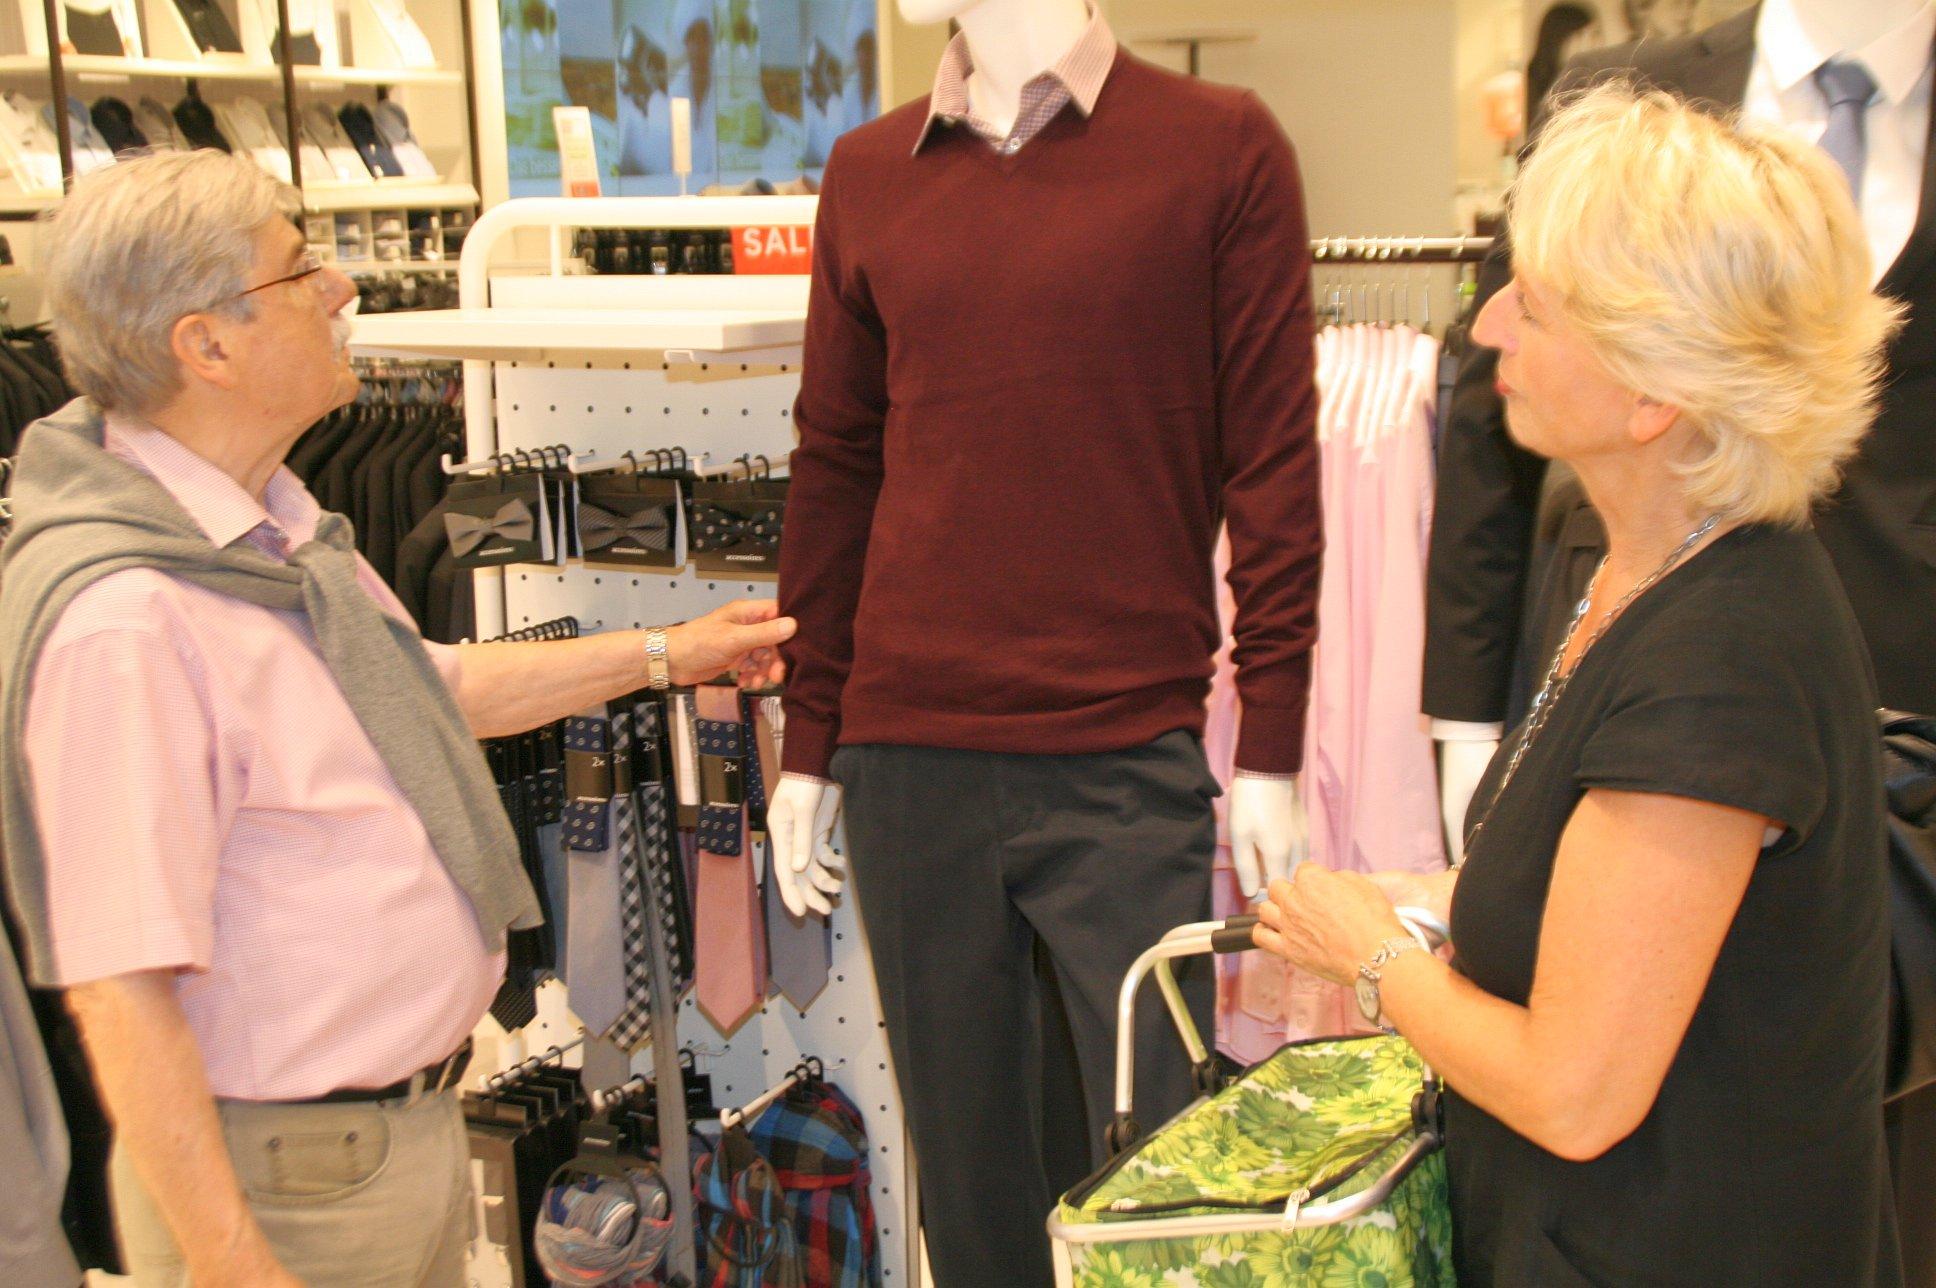 seniorenbetreuung-muenchen-lebensfreude-66-plus-kleiderkauf